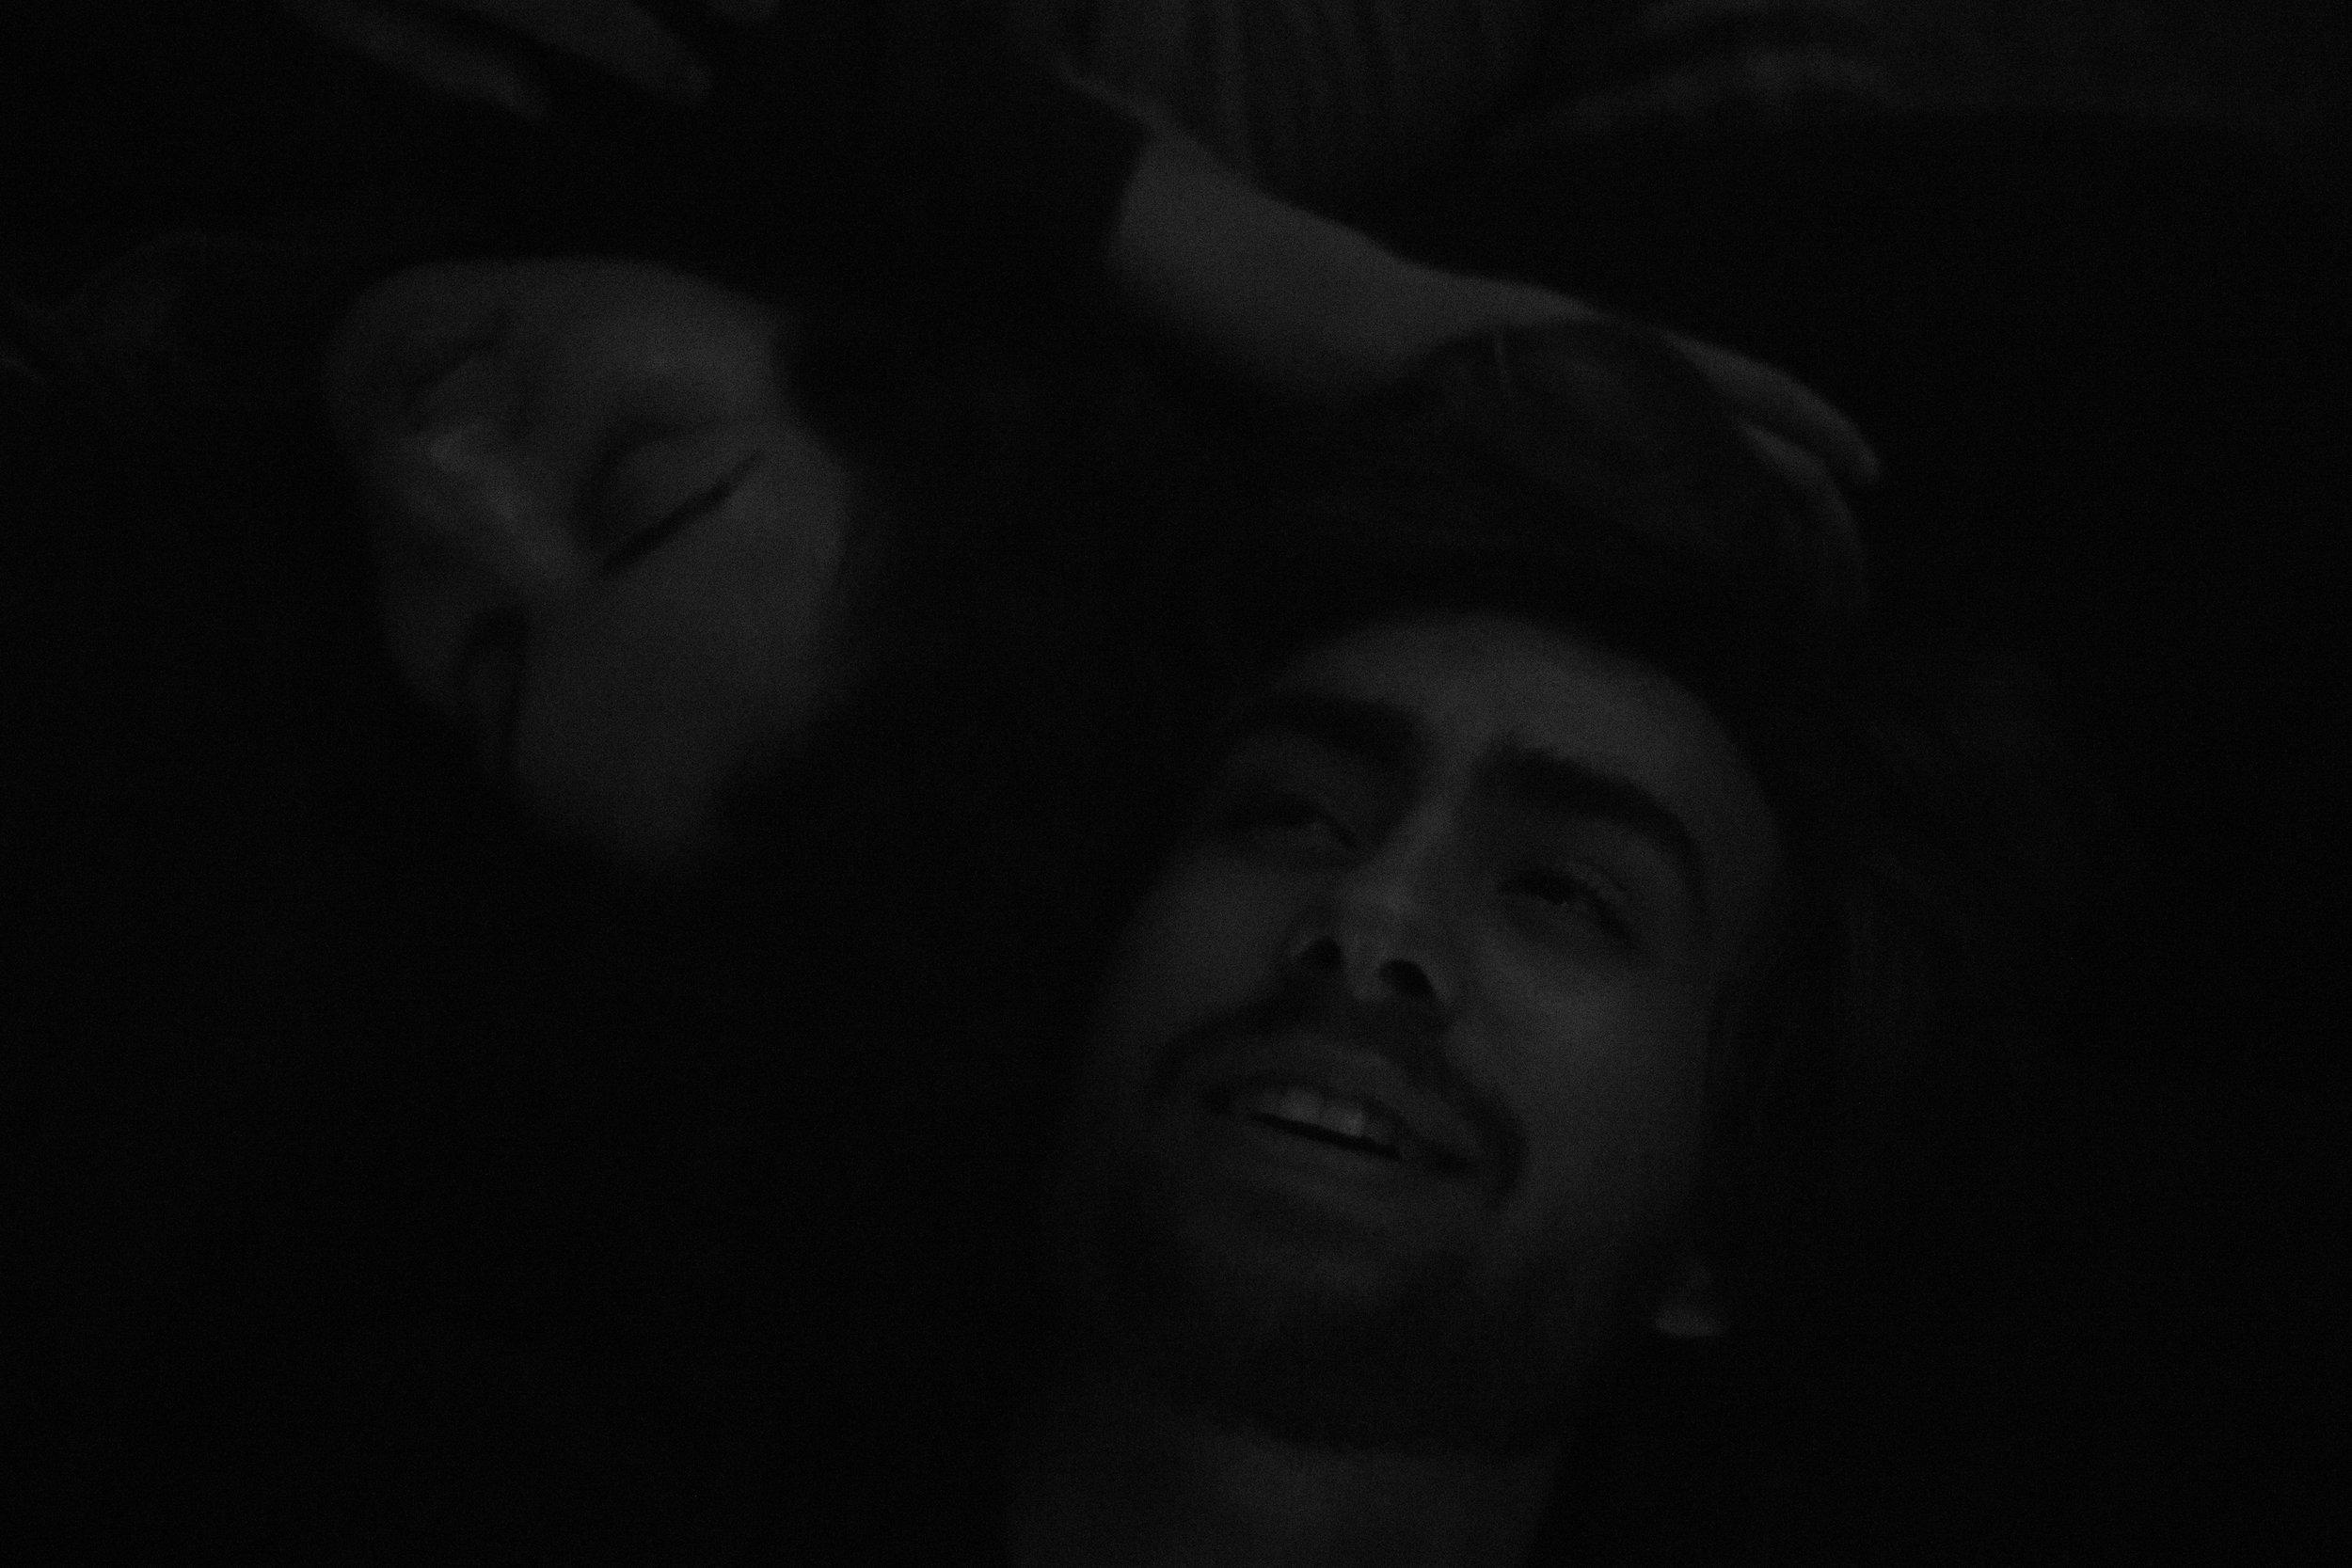 Sean & Alexis, 2016